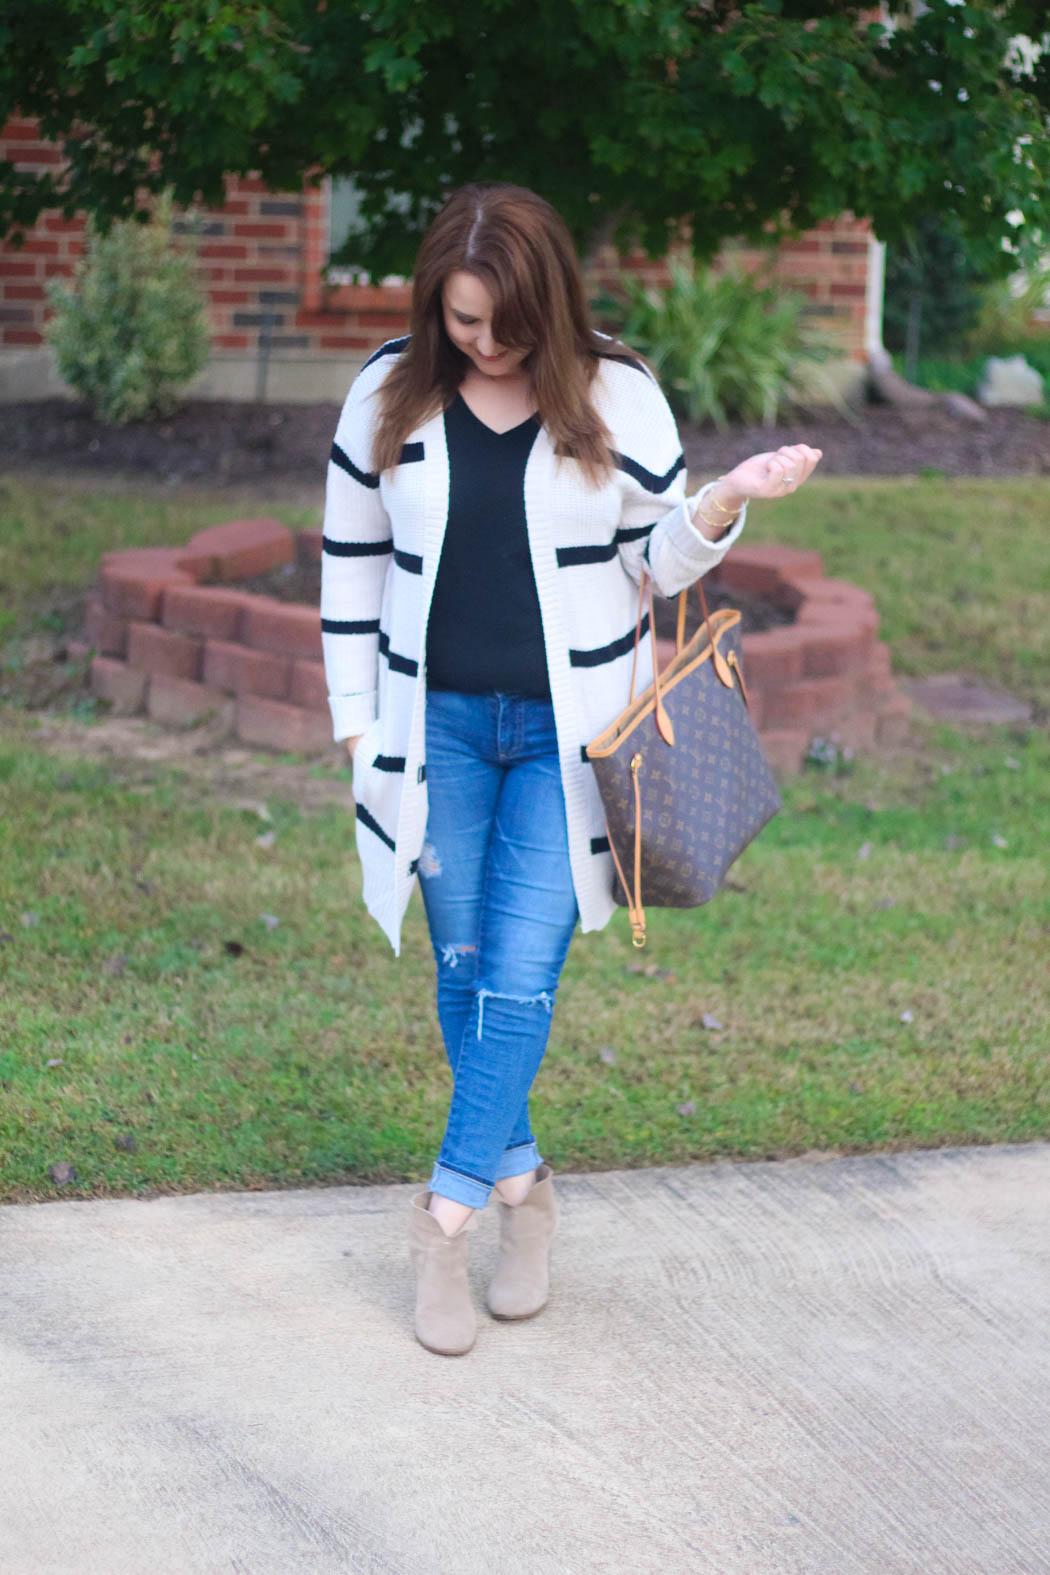 striped-cardigan-madewell-tee-ag-jeans-5